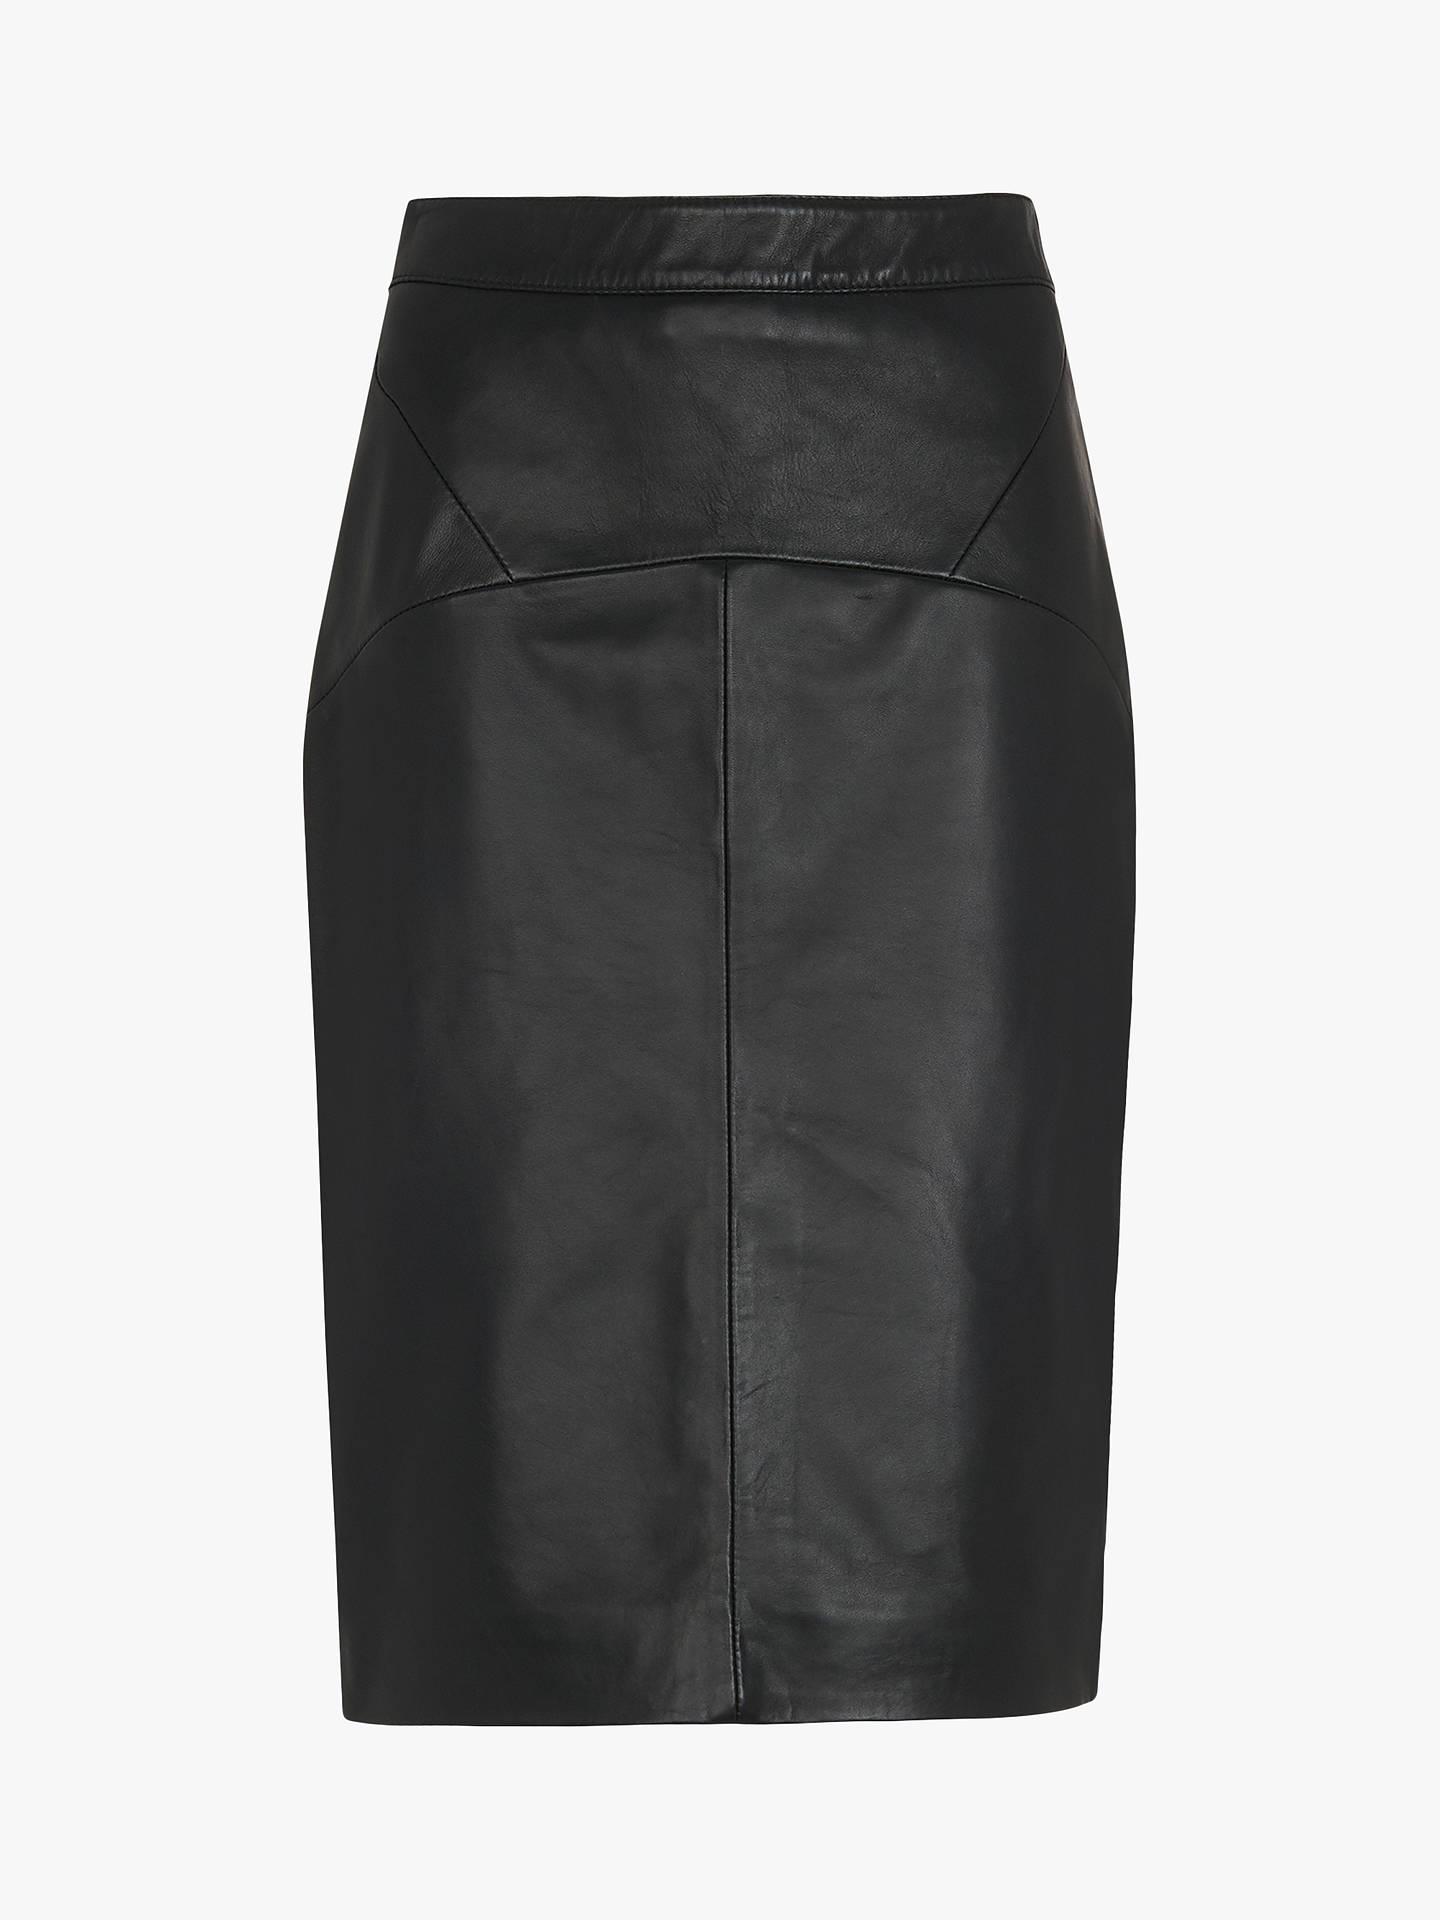 3c68c82b80 ... Buy Whistles Kel Leather Pencil Skirt, Black, 6 Online at johnlewis.com